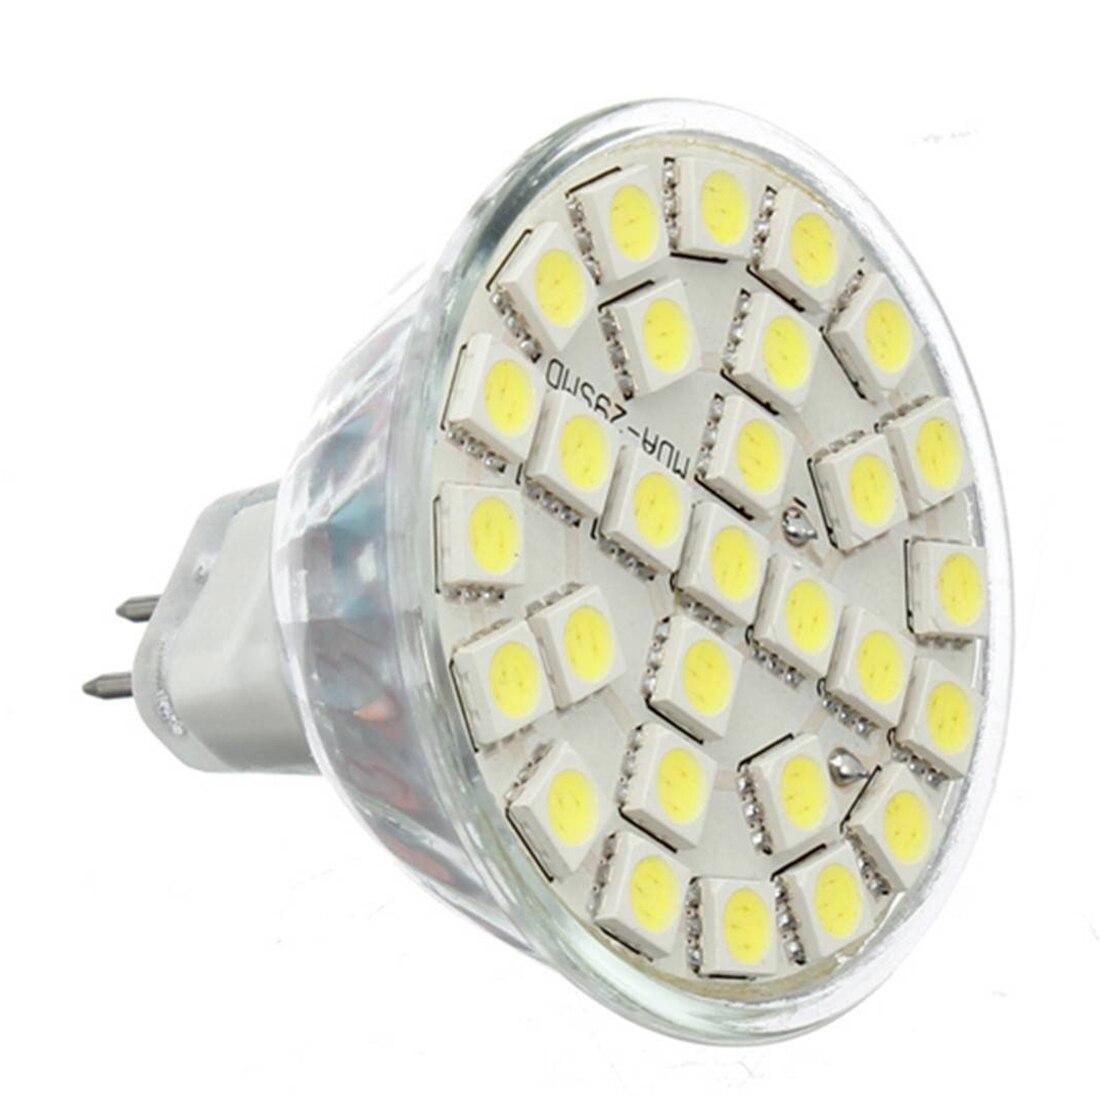 10X Gu5.3 MR16 5W Cold White 5050SMD 29LED 480LM High Power LED Spotlight Bulbs 220V carprie super drop ship new 2 x canbus error free white t10 5 smd 5050 w5w 194 16 interior led bulbs mar713